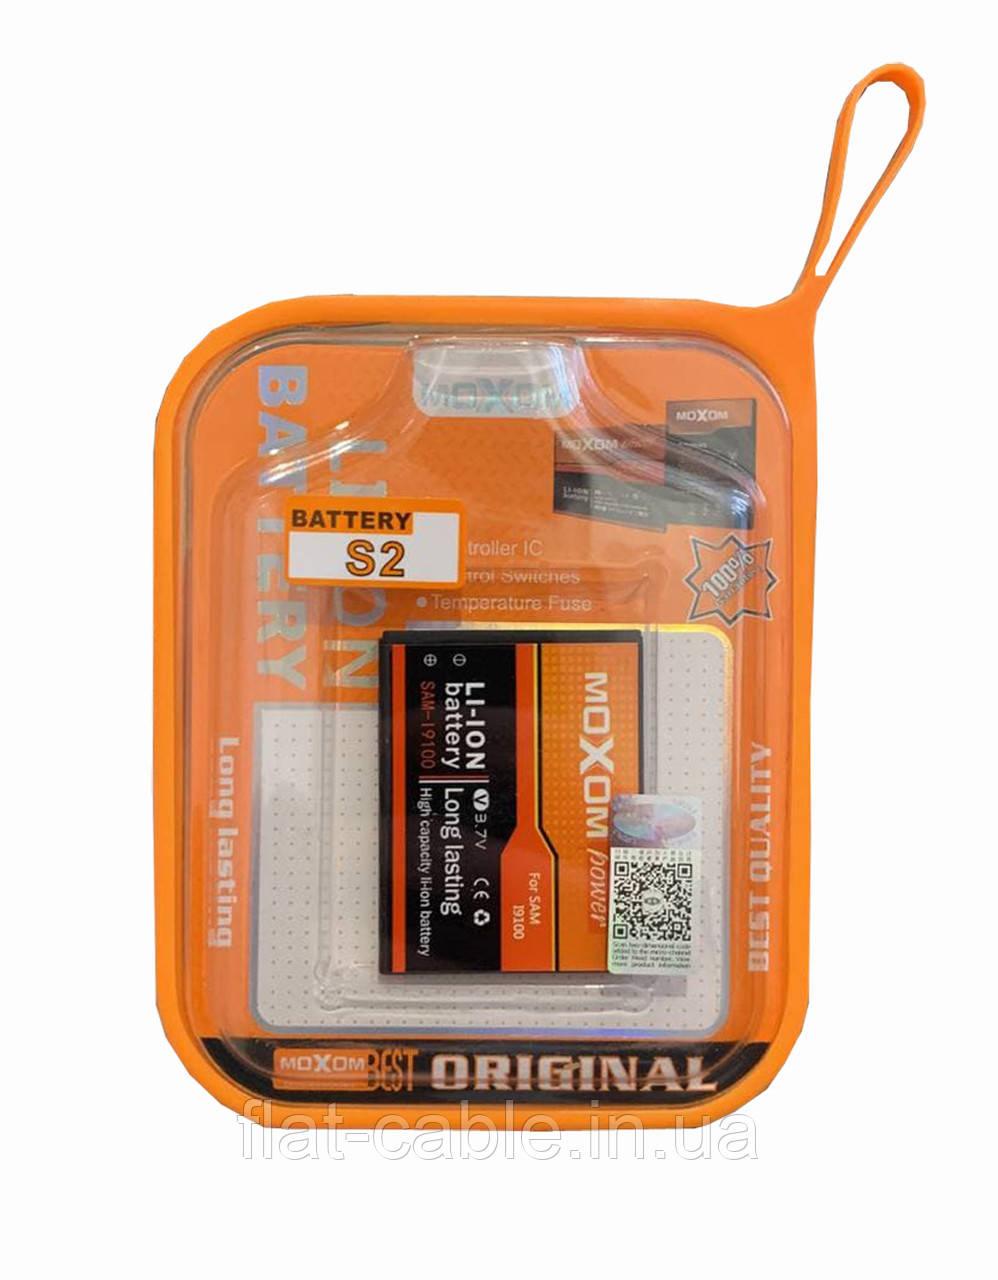 Батарея (акумулятор) для Samsung i9100 Galaxy S2/ i9103/ i9105 Moxom